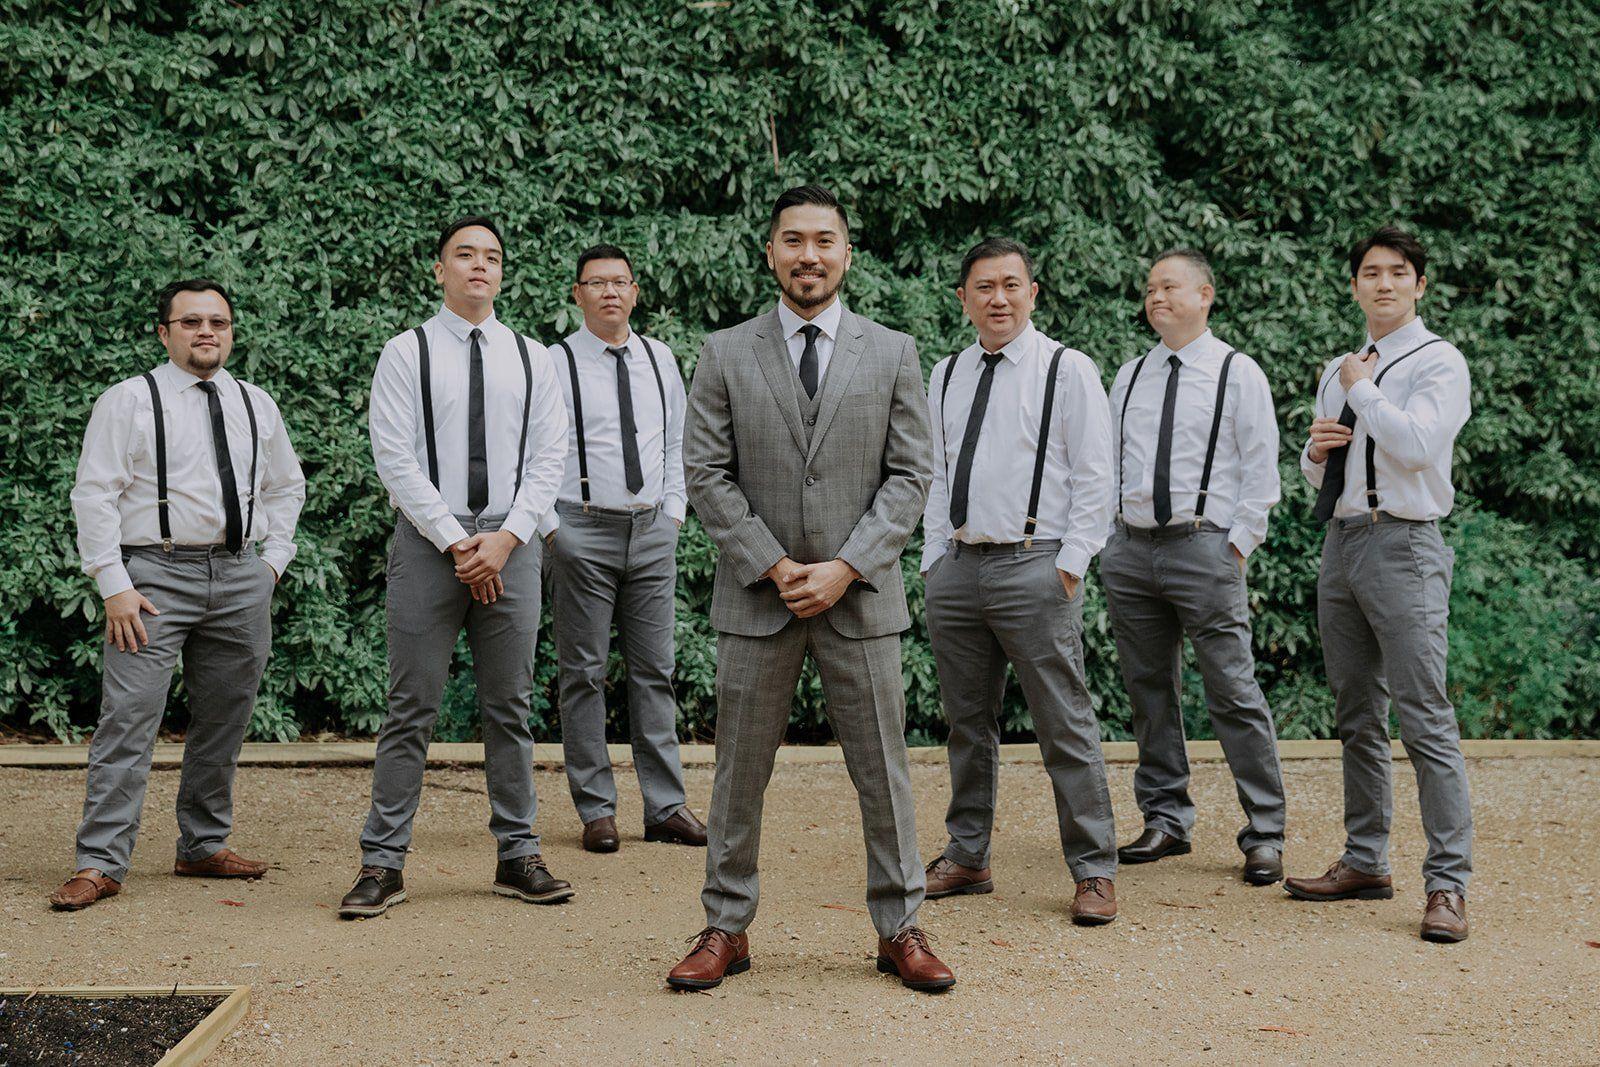 destination wedding groomswear